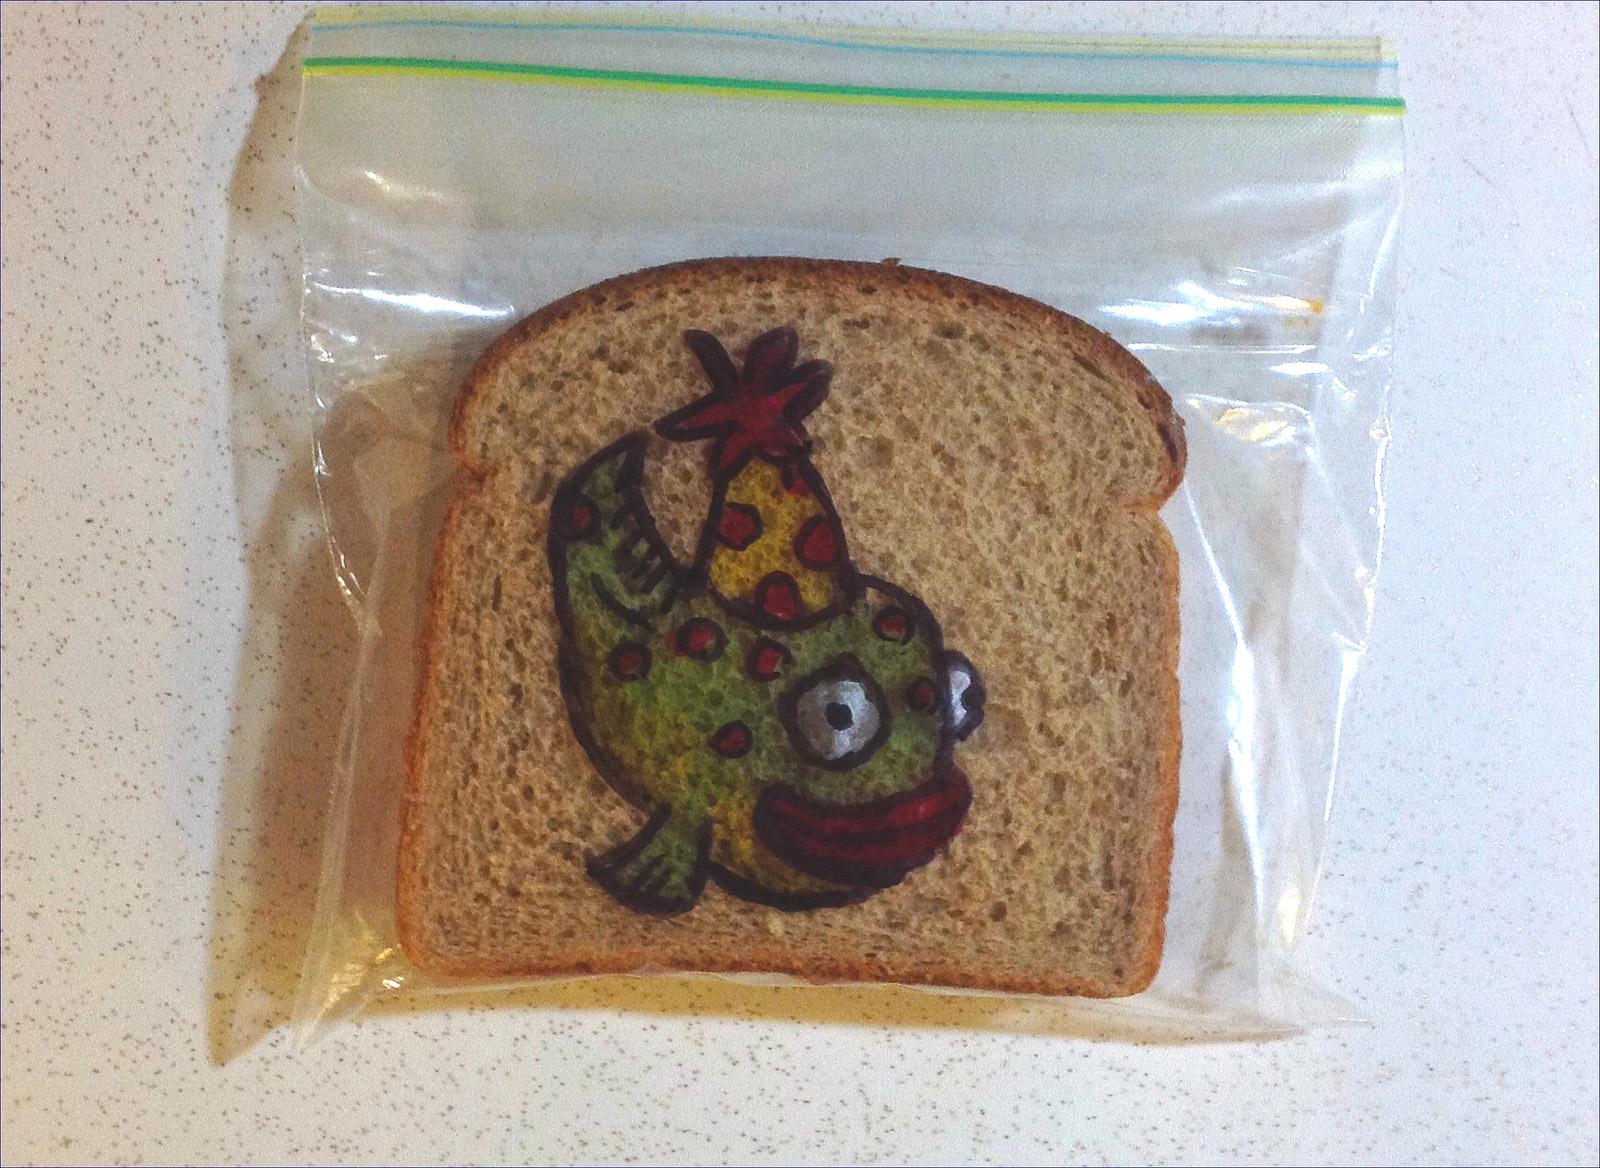 david-laferriere-creative-lunch-bag-illustration-23